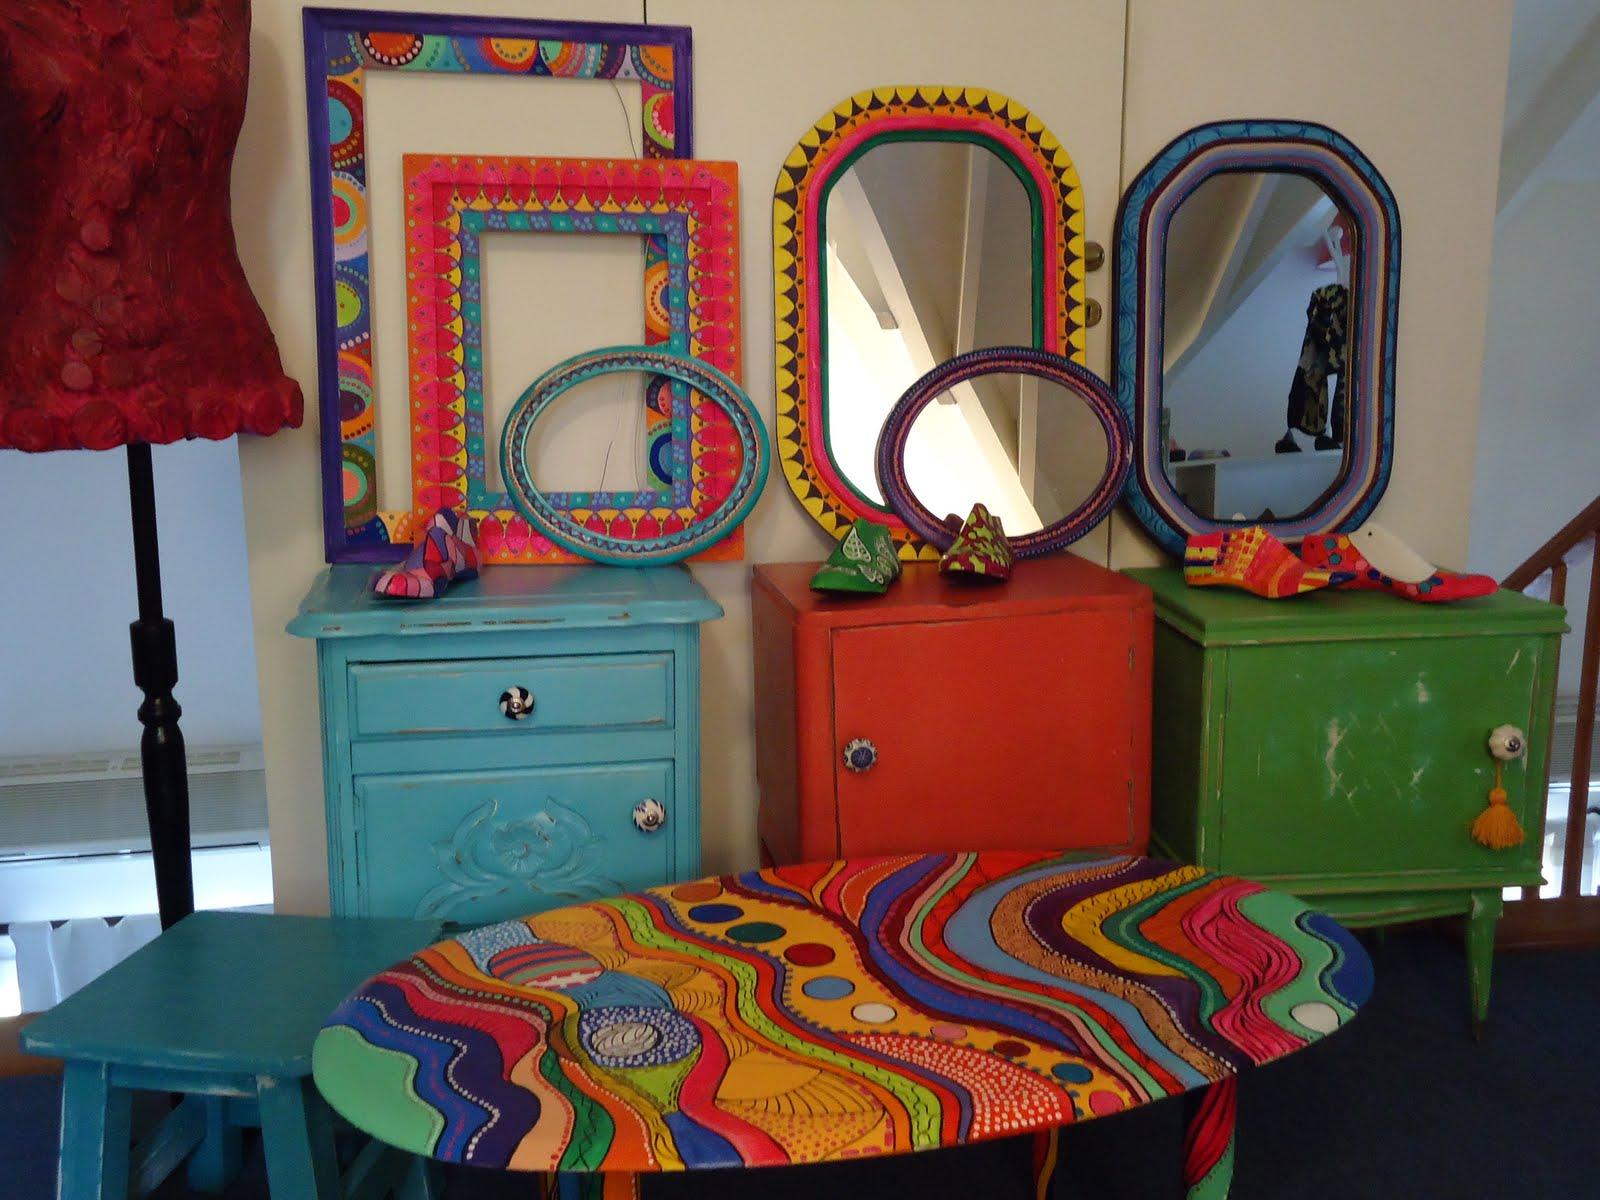 Vintouch muebles reciclados pintados a mano marcos for Muebles de mimbre pintados